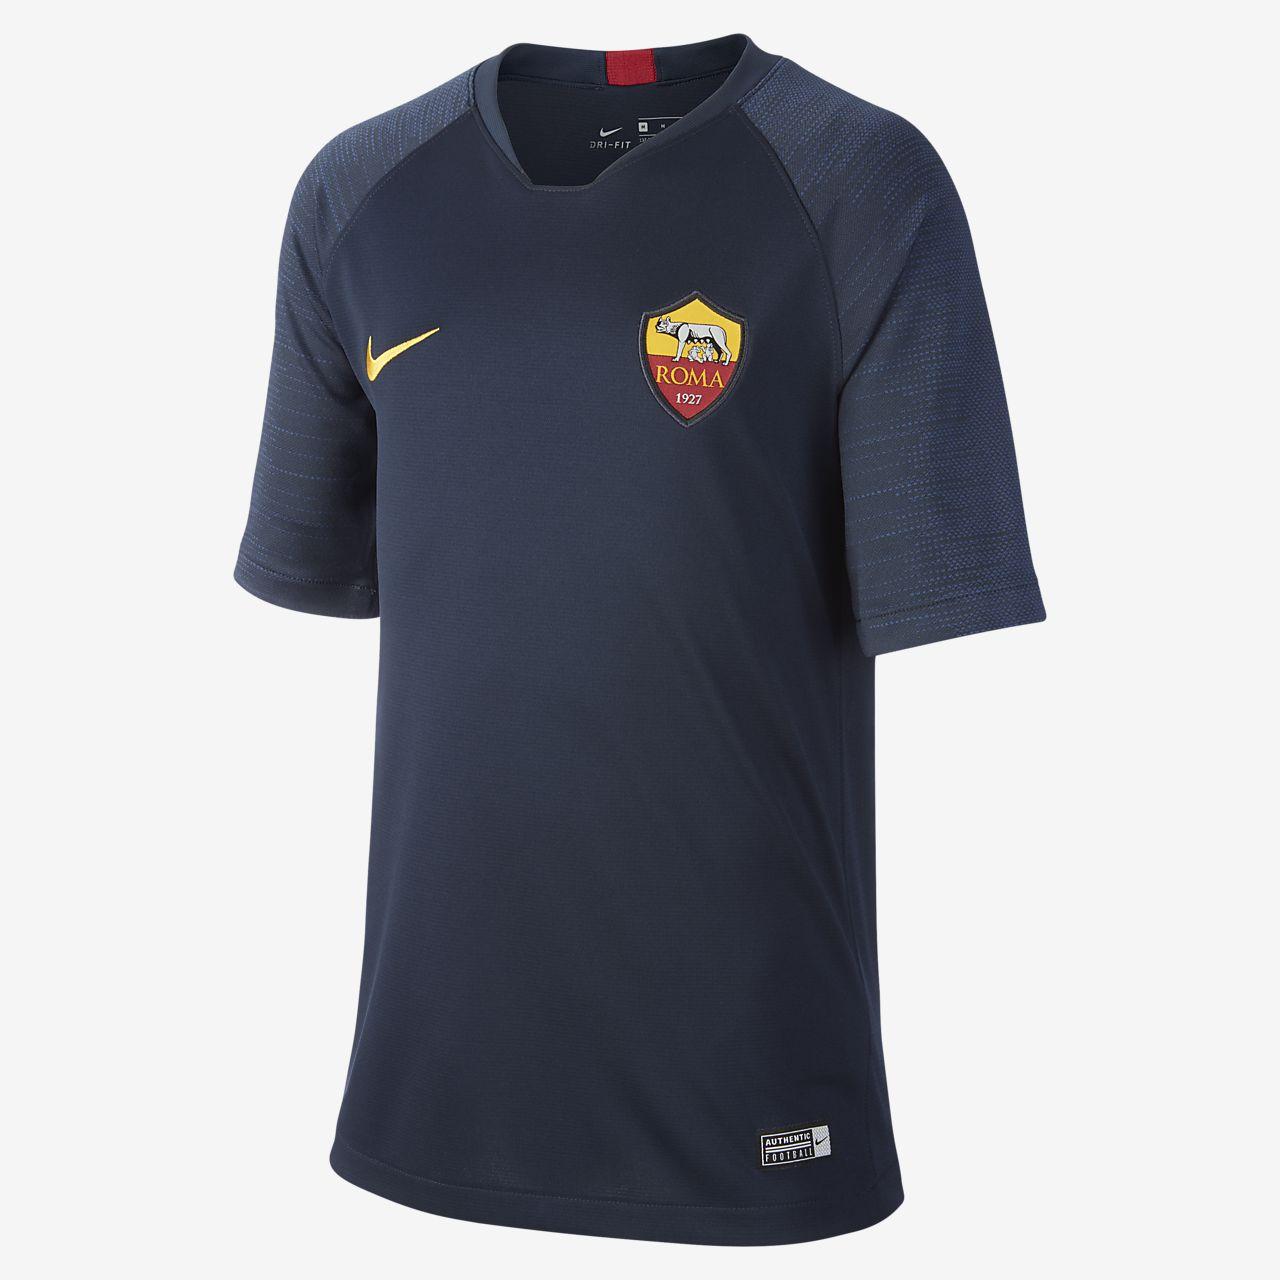 Игровая футболка с коротким рукавом для школьников Nike Breathe A.S. Roma Strike